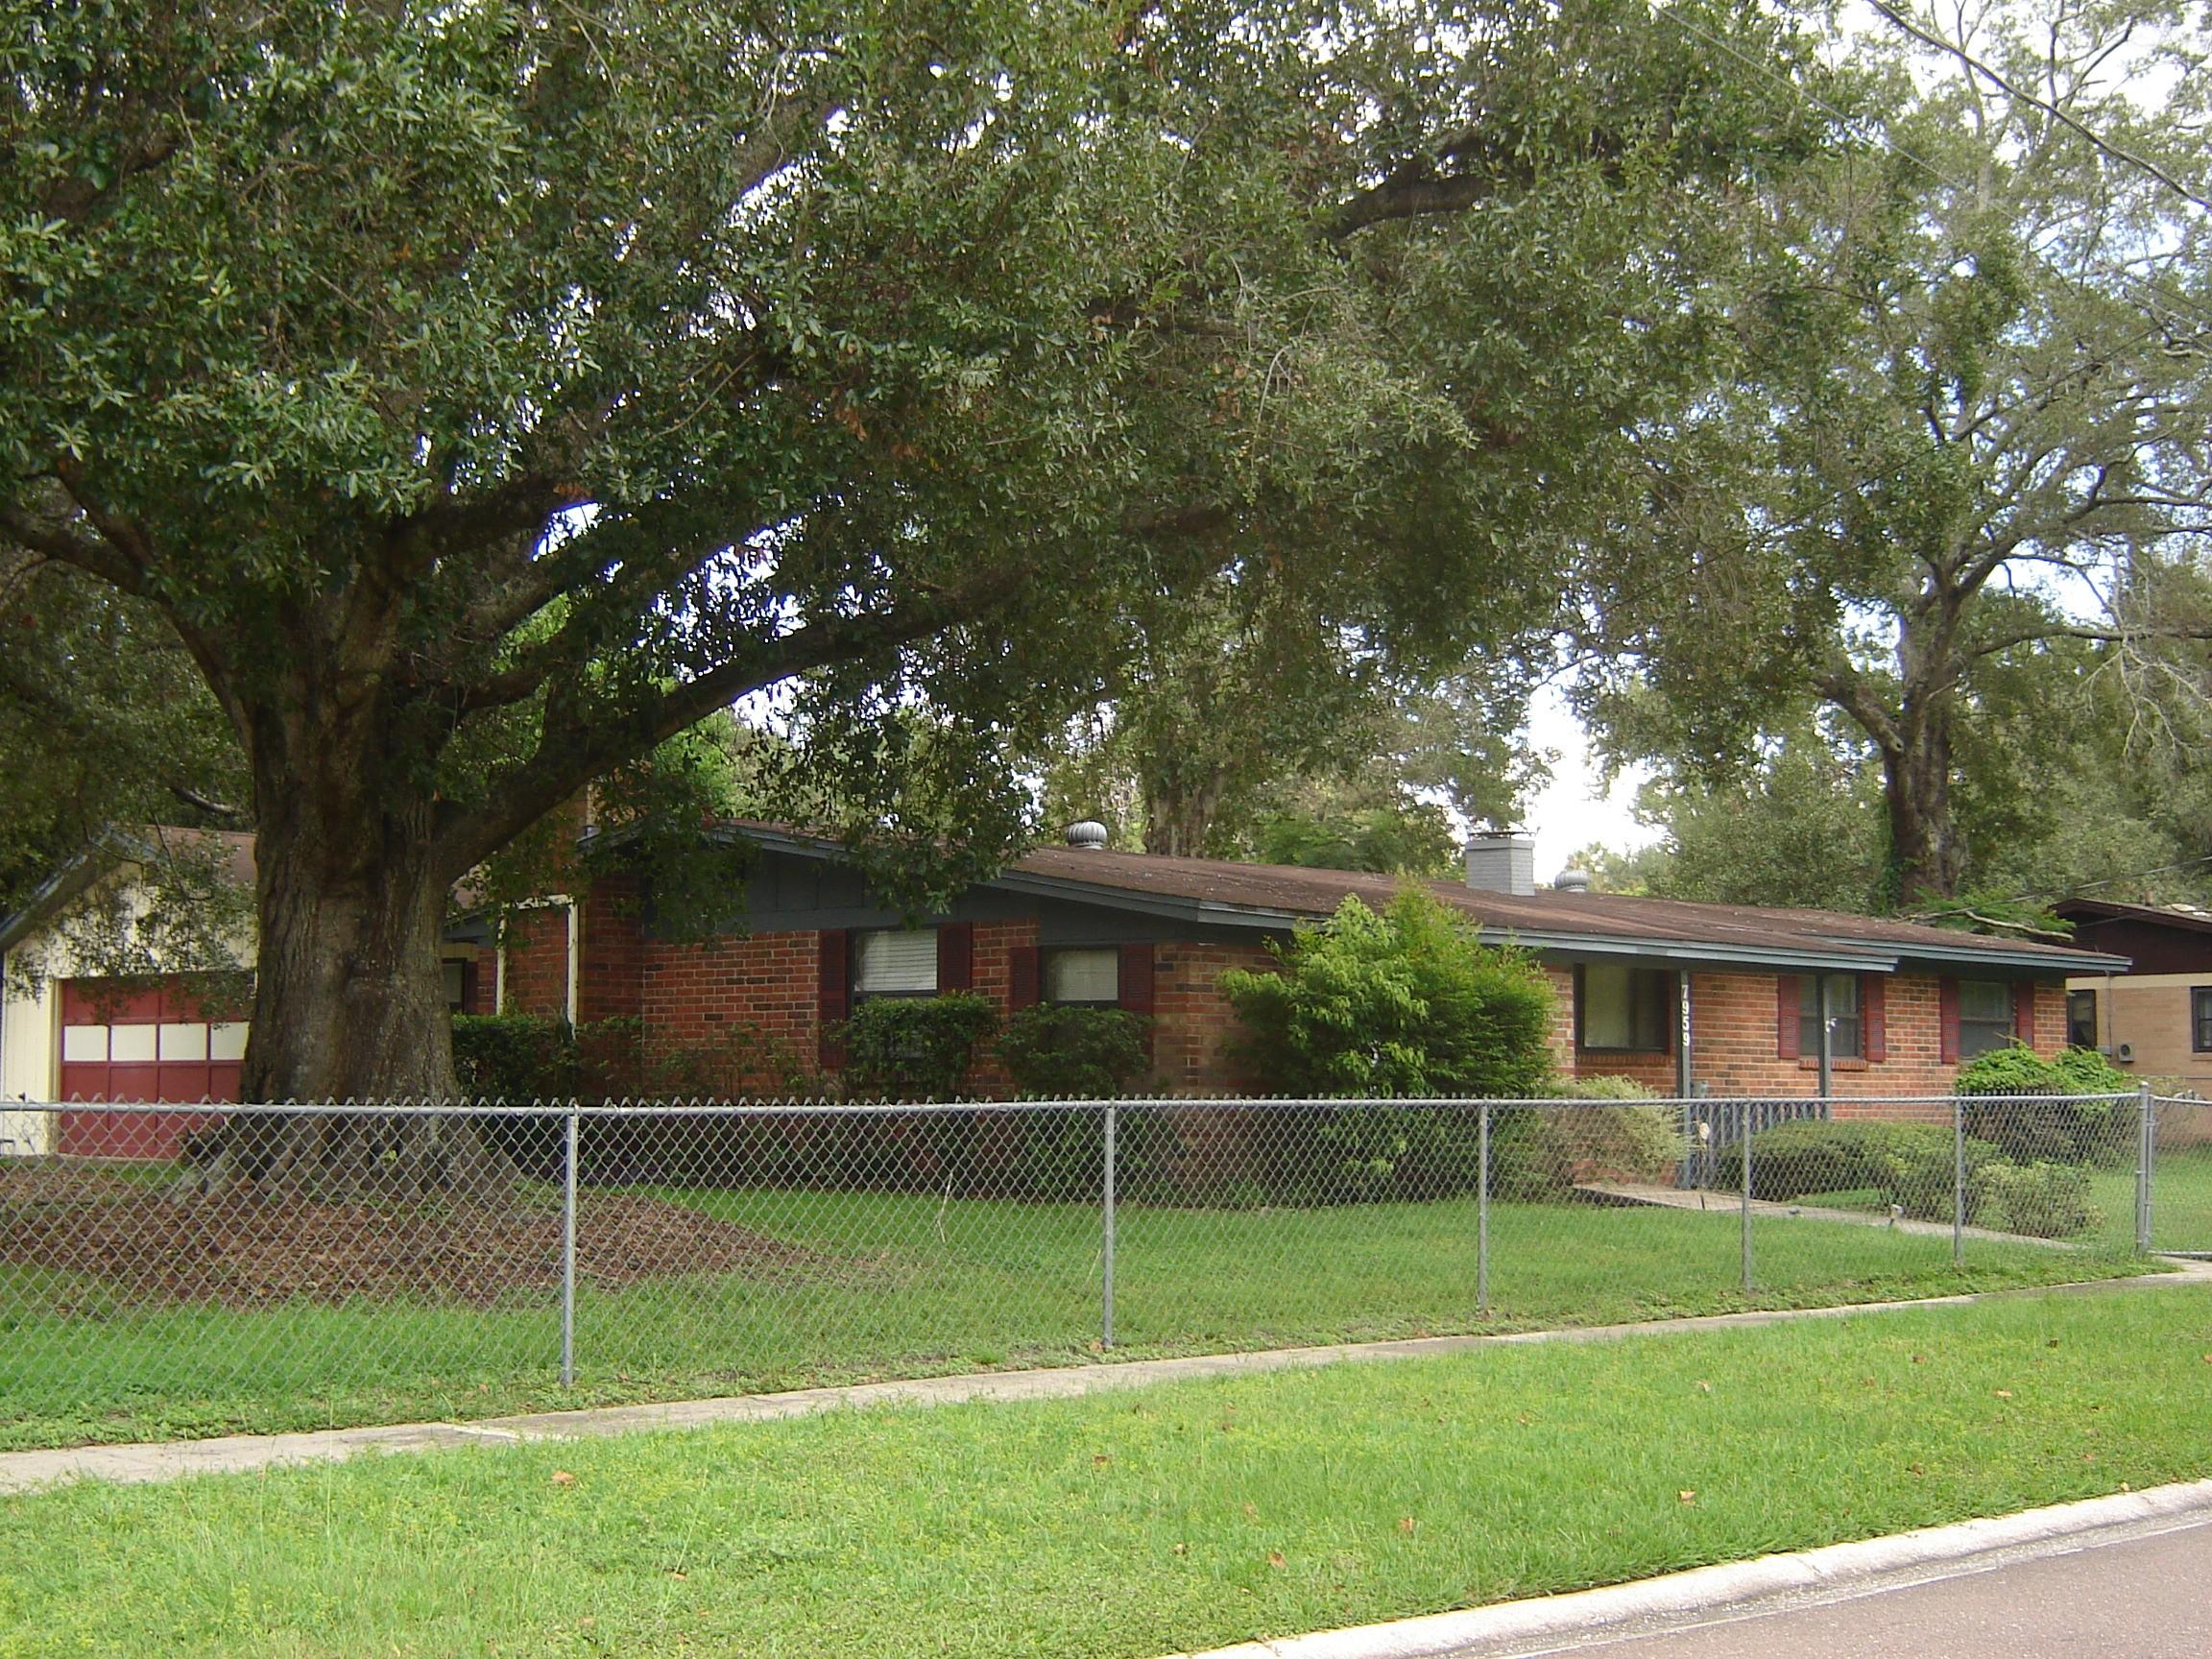 7959 Lancia St N Jacksonville Fl 32244 3 Bedroom Apartment For Rent For 950 Month Zumper